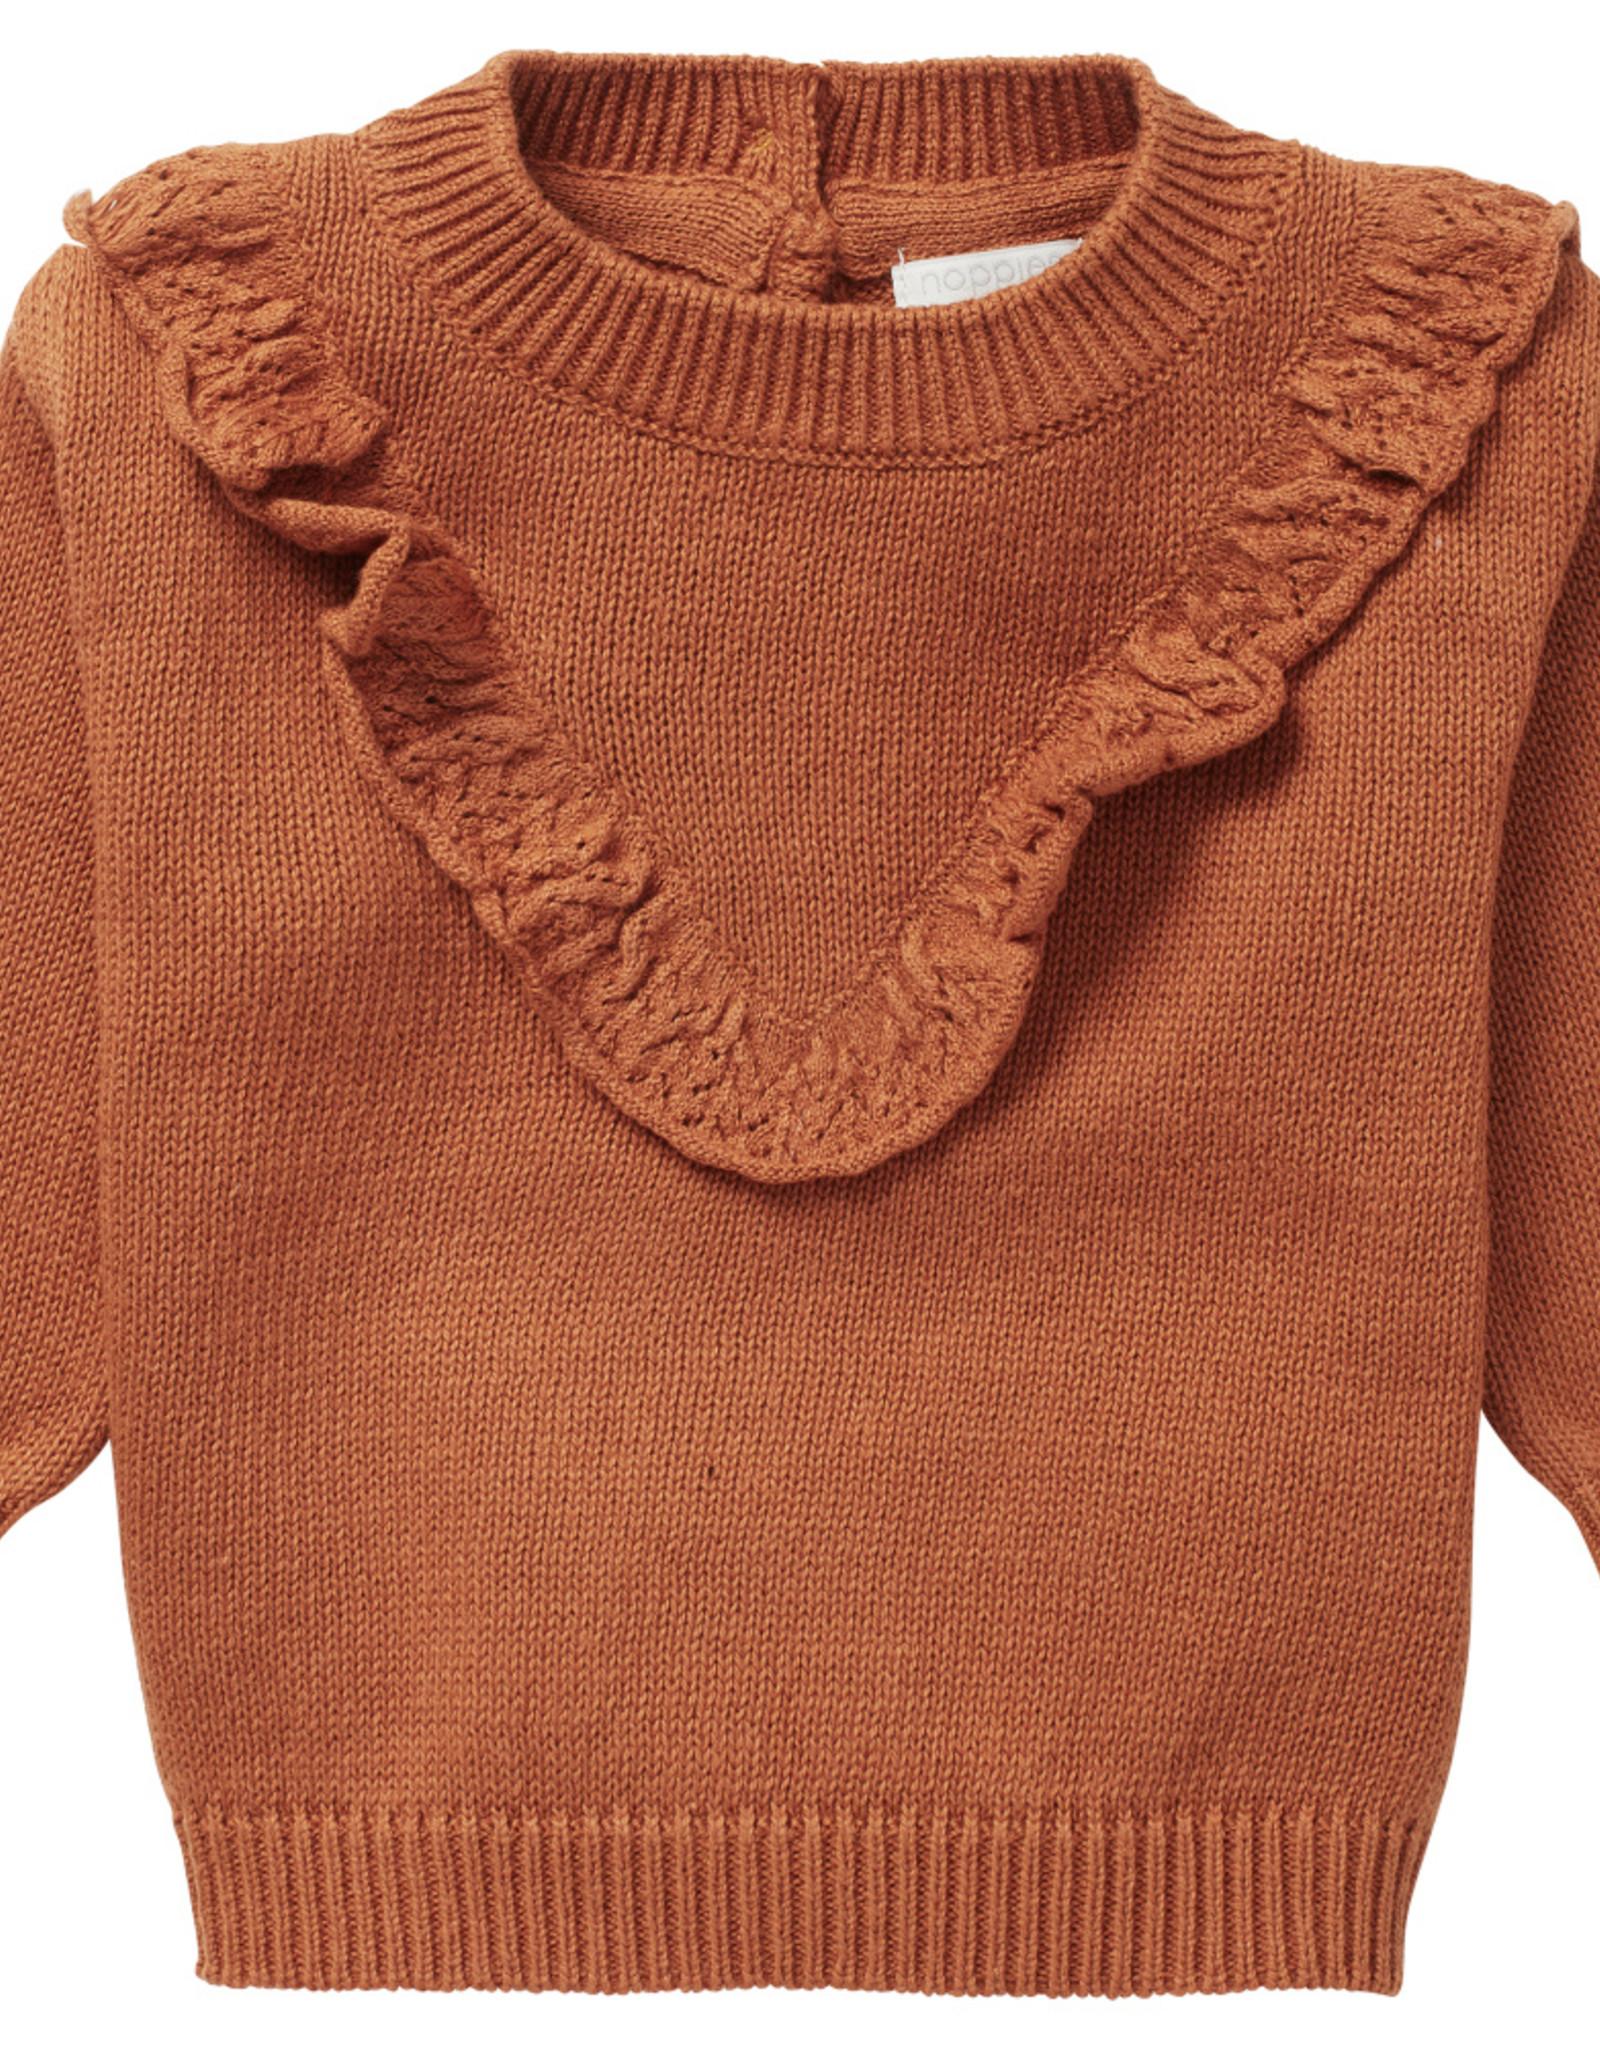 Noppies SP21 BbyG Brown Magrath Sweater